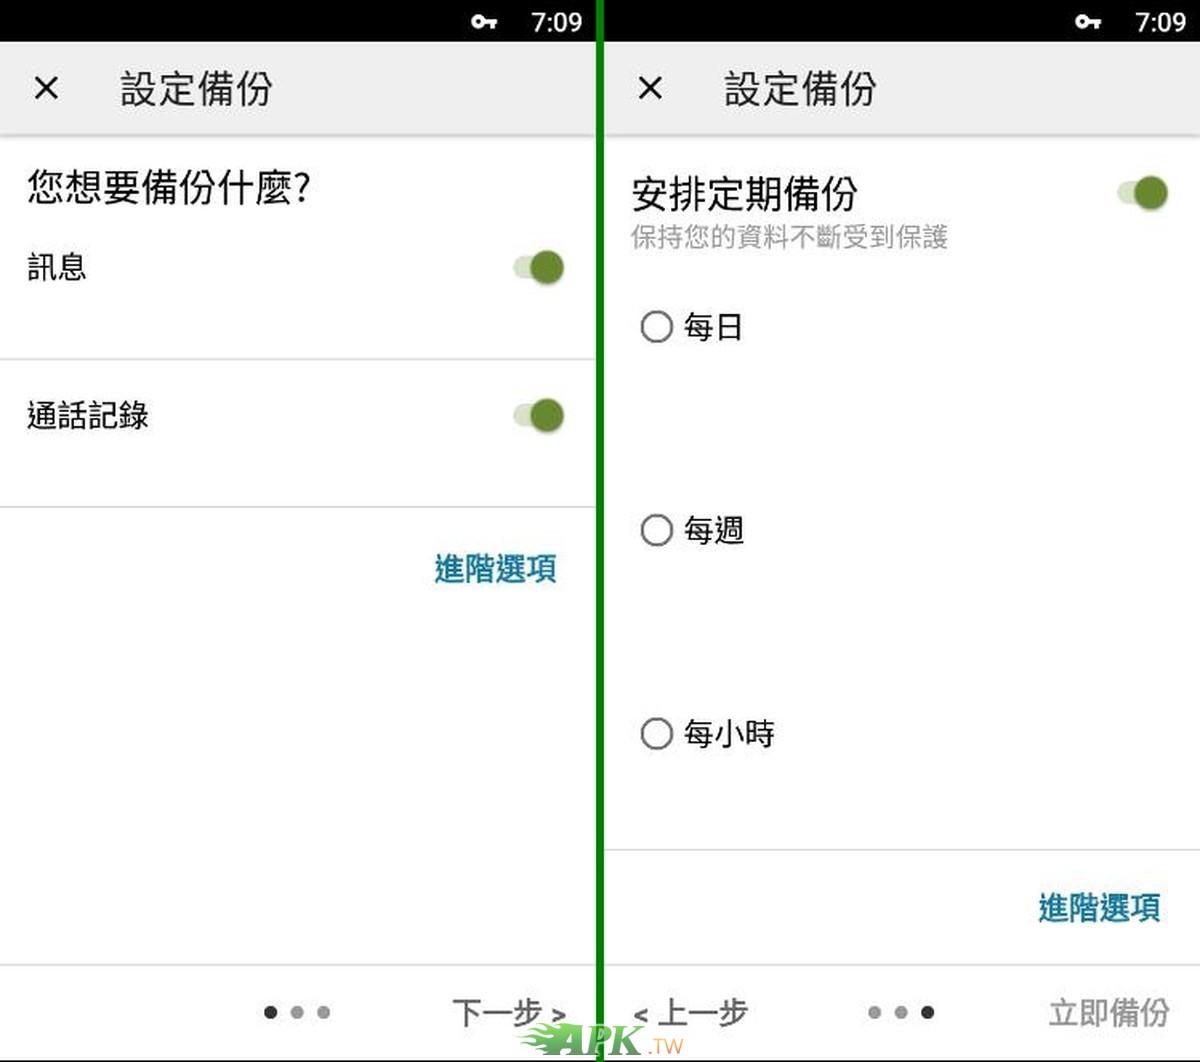 SMS__2.jpg